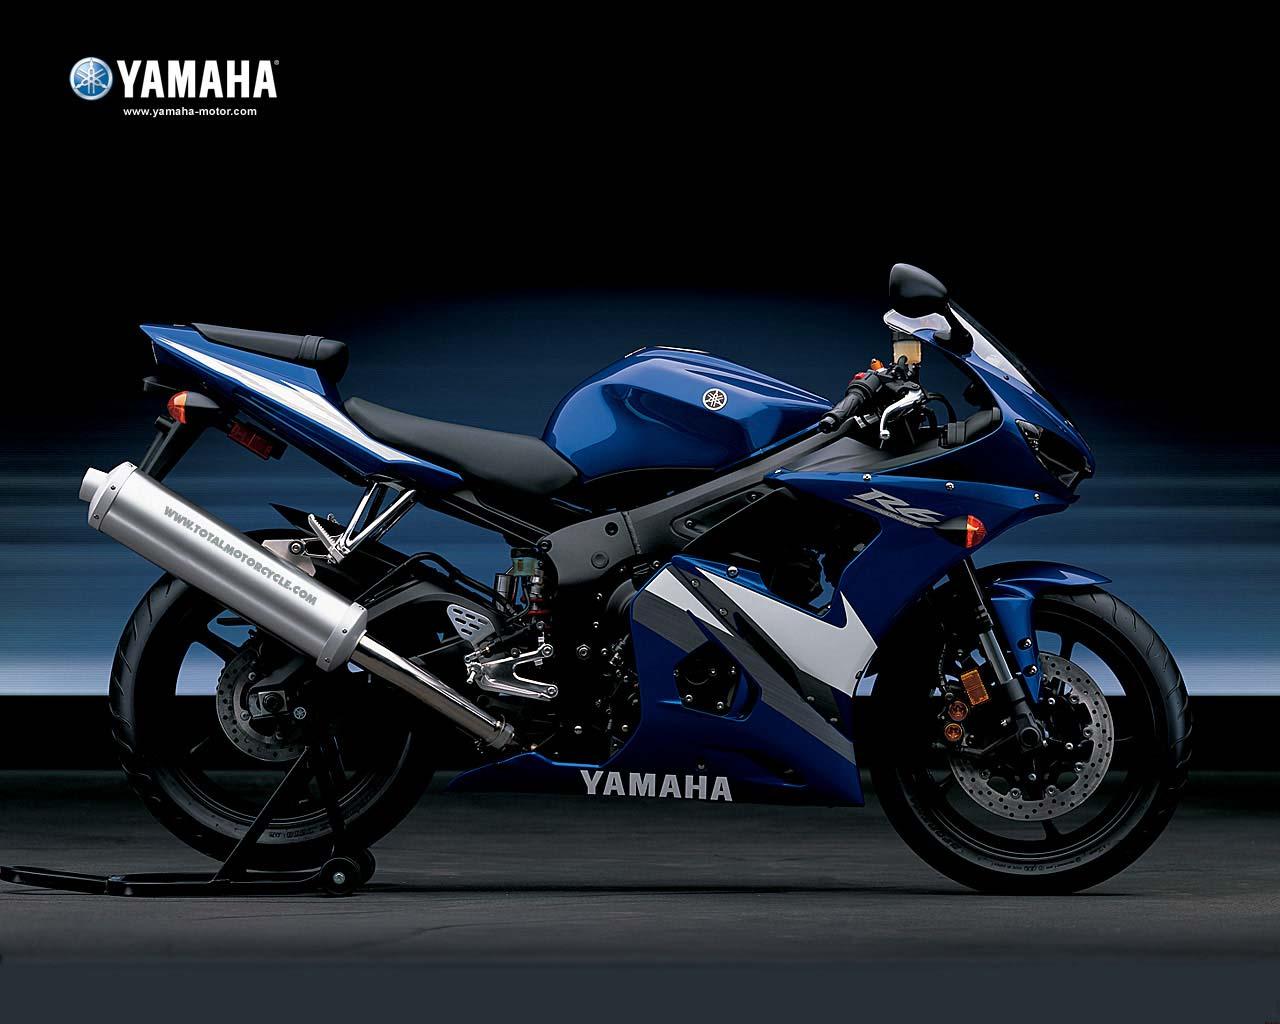 Yamaha r6 yamaha r6 yamaha r6 yamaha r6 yamaha r6